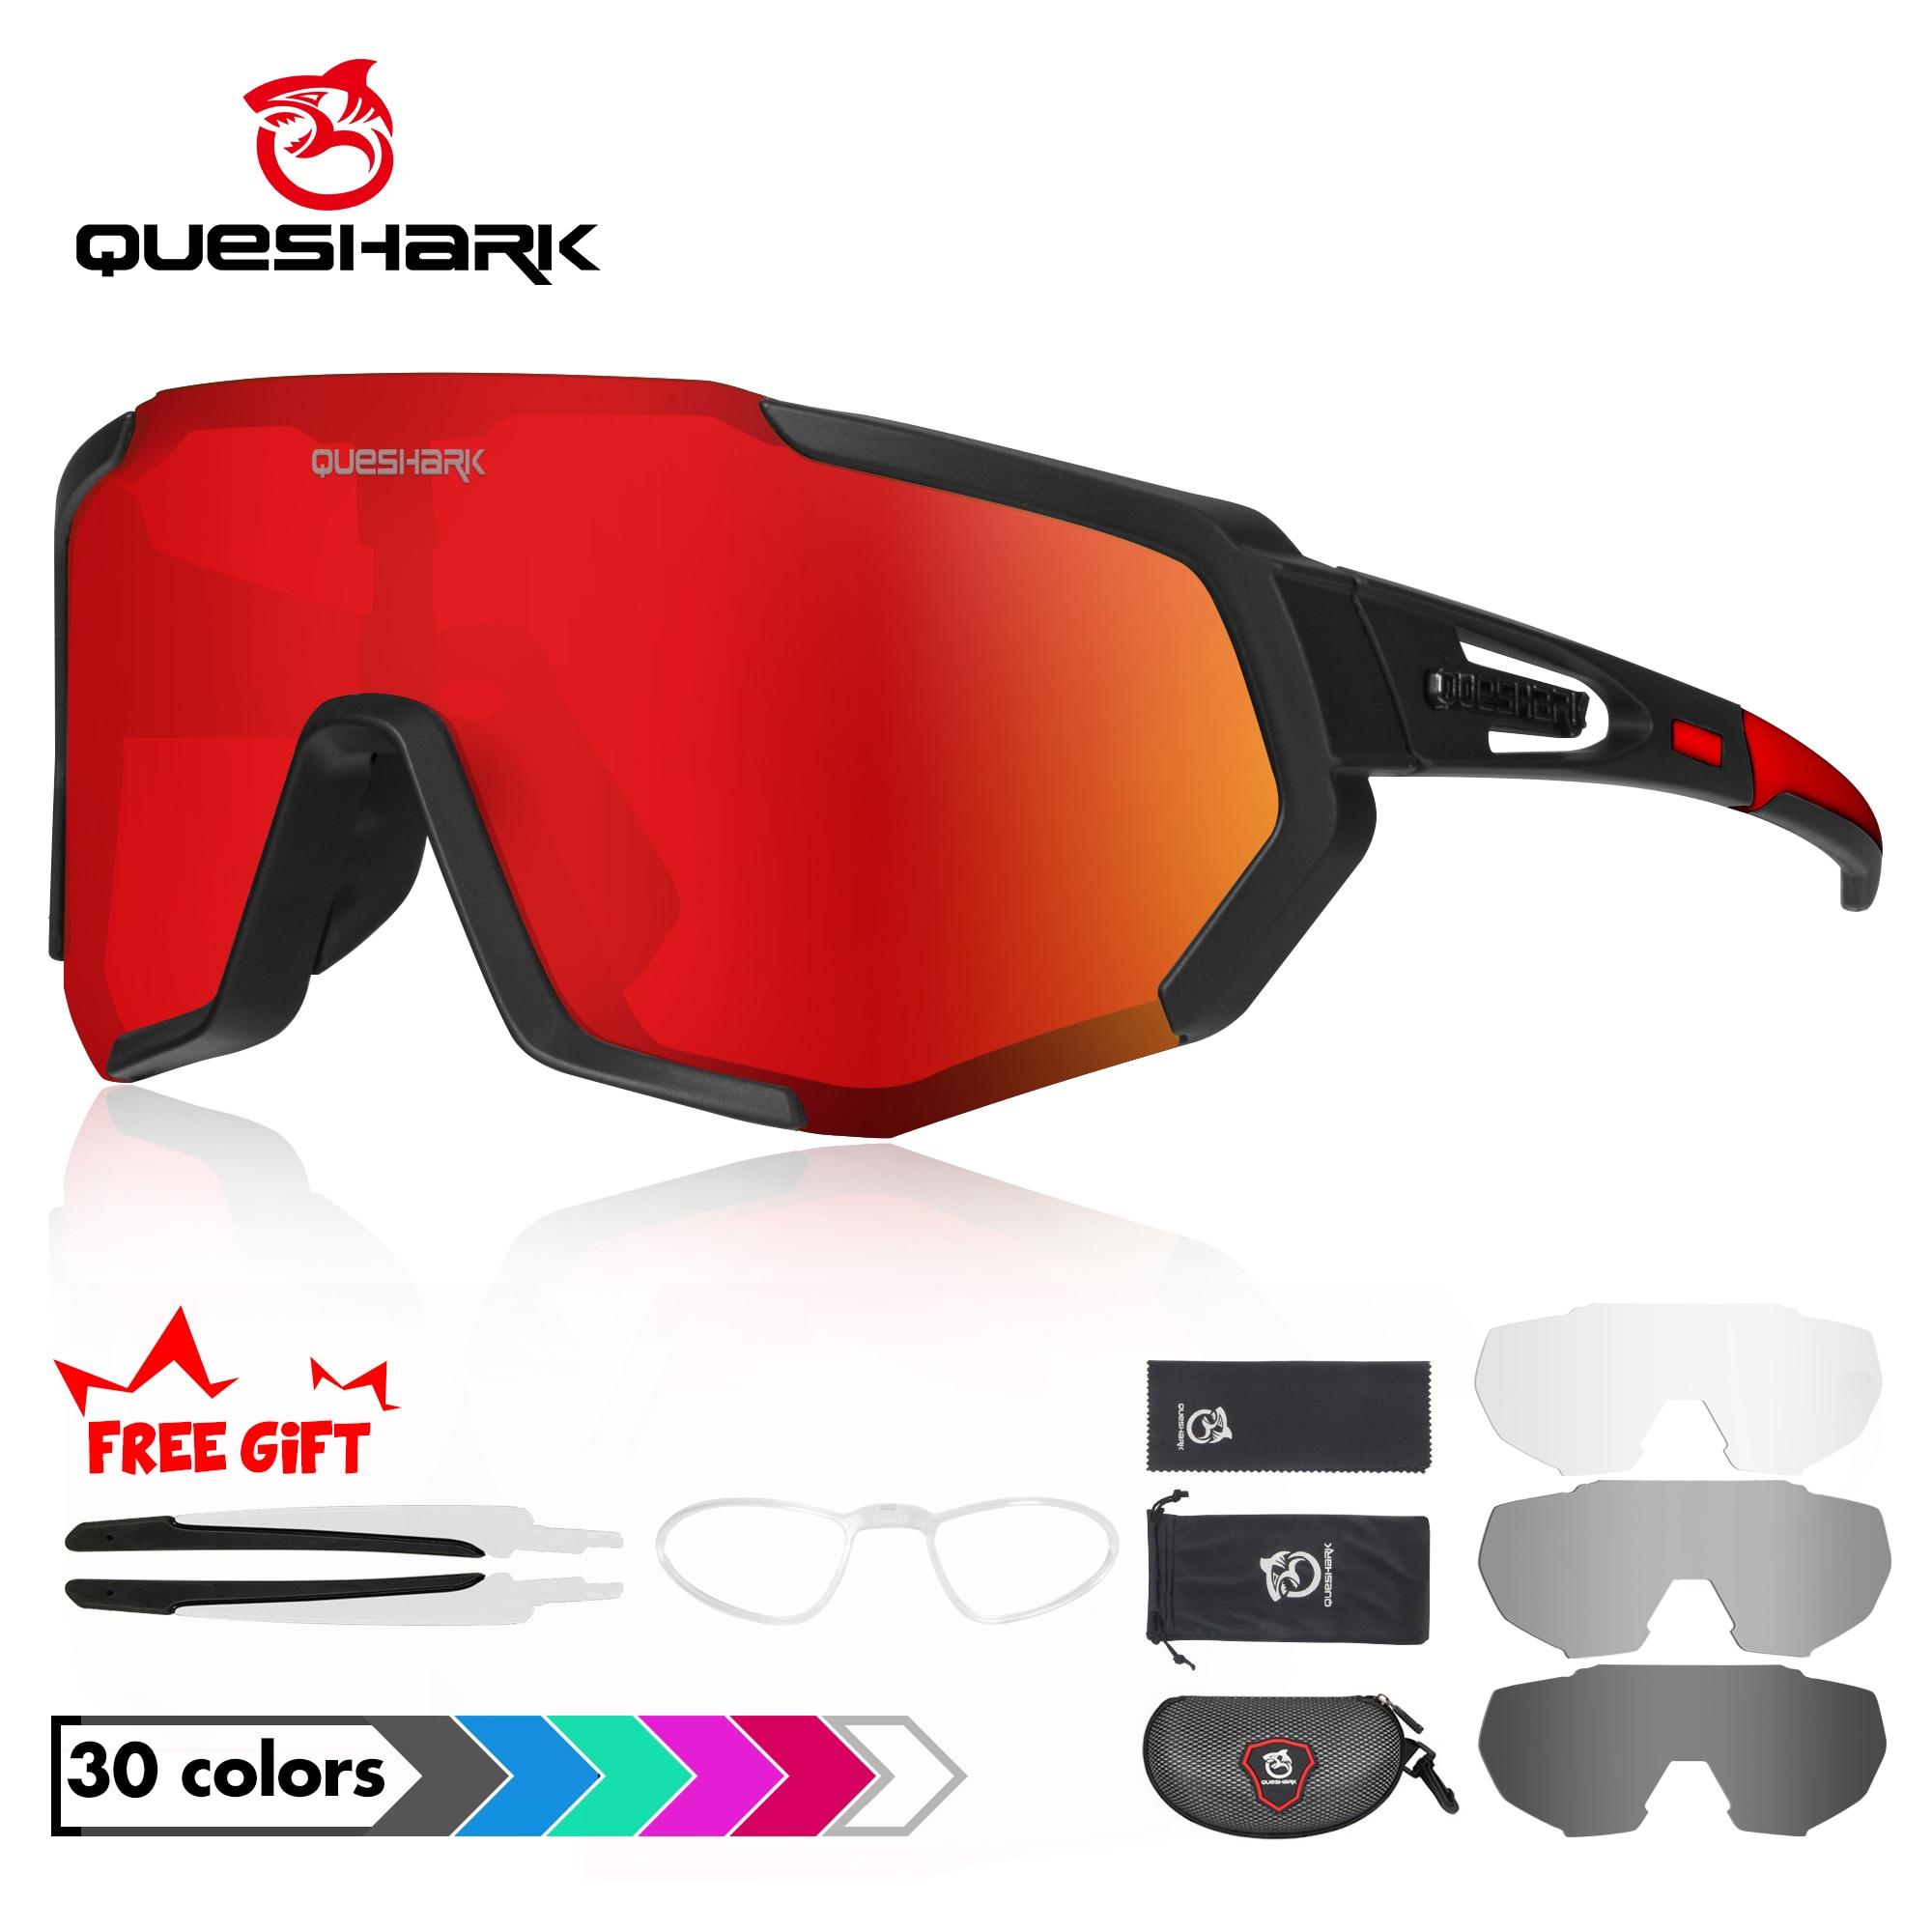 QUESHARK Polarized Cycling Glasses For Man Women Bike Eyewear Cycling Sunglasses 4 Lens UV400 Sport Glasses QE48 1